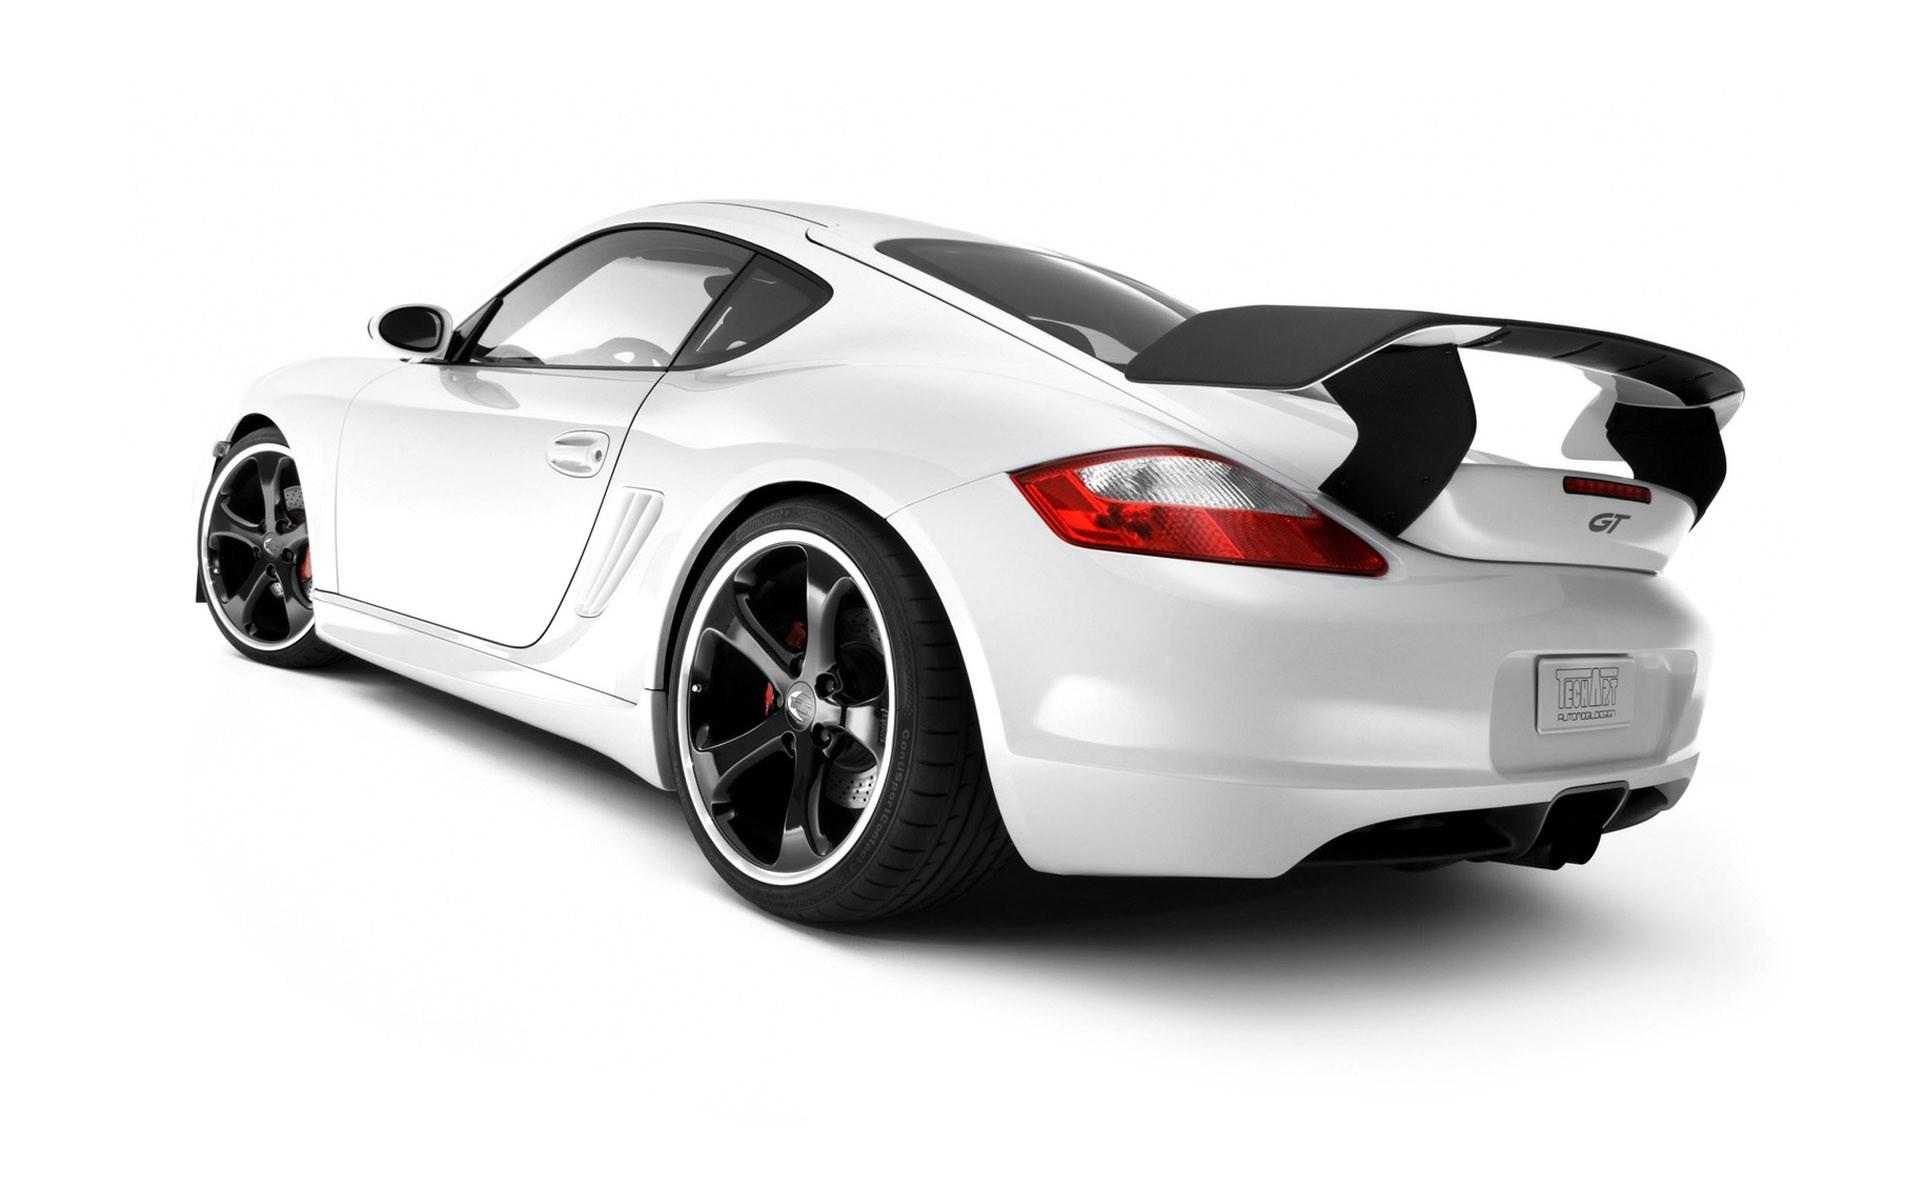 General 1920x1200 Porsche car white cars Porsche Cayman vehicle TechArt German cars